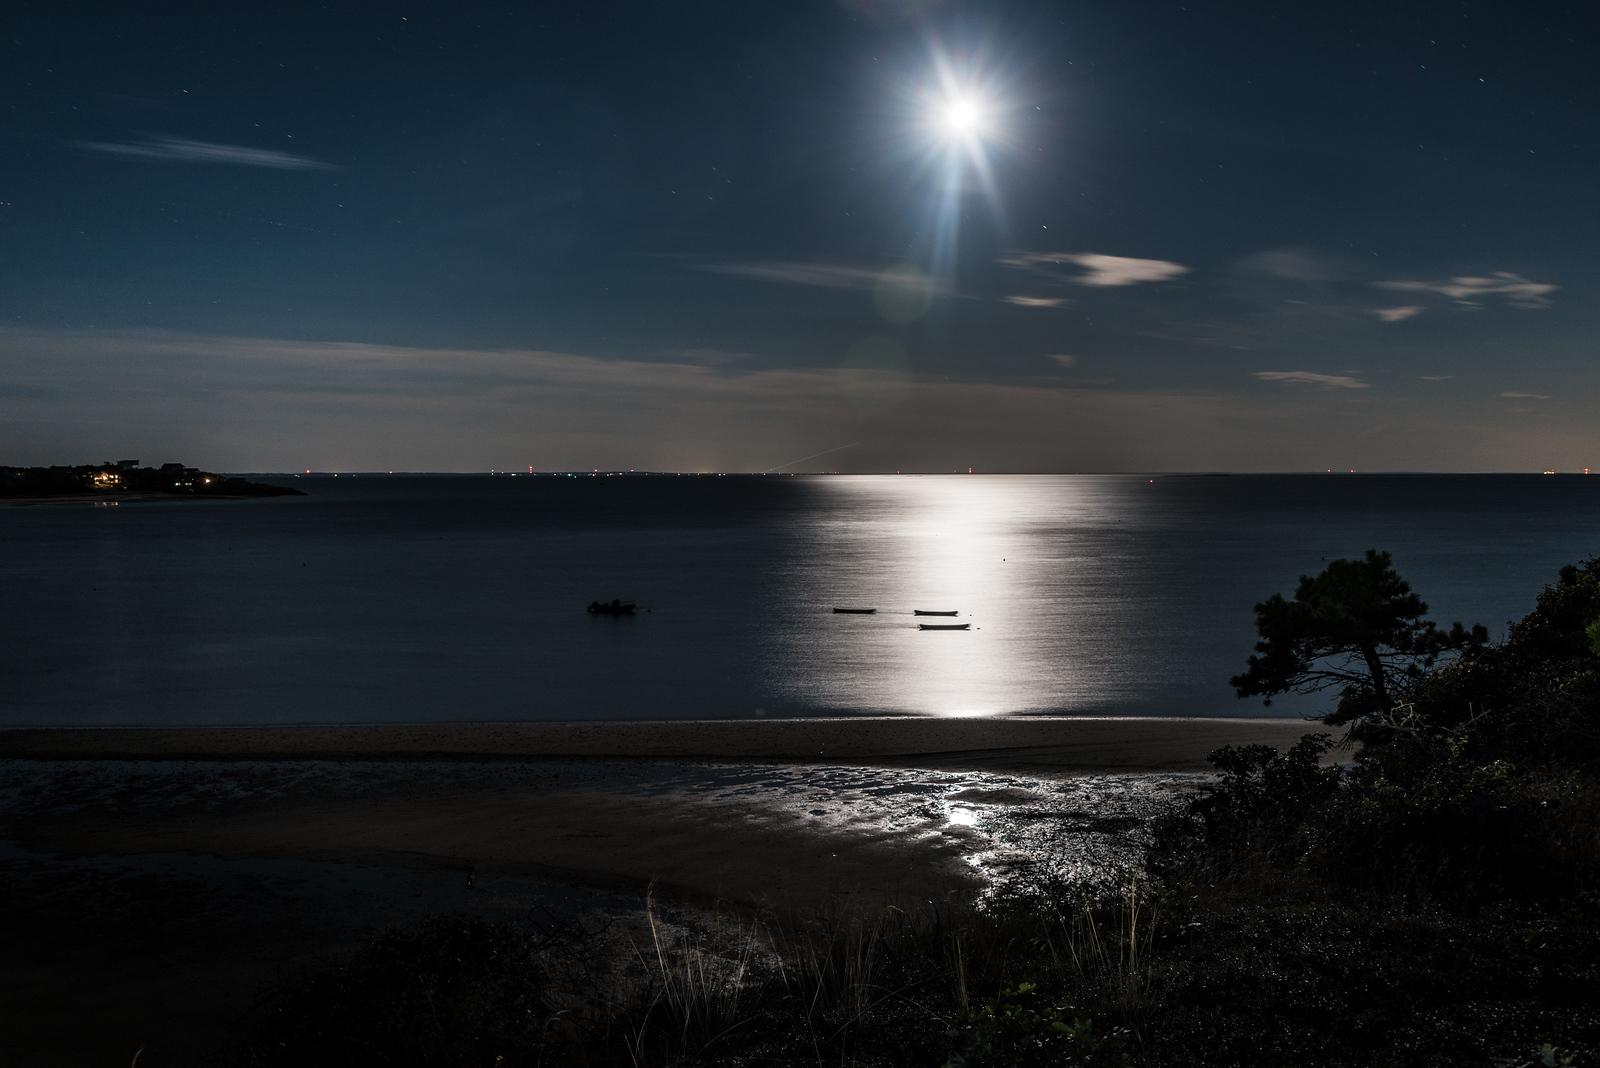 NightBoats-38.jpg